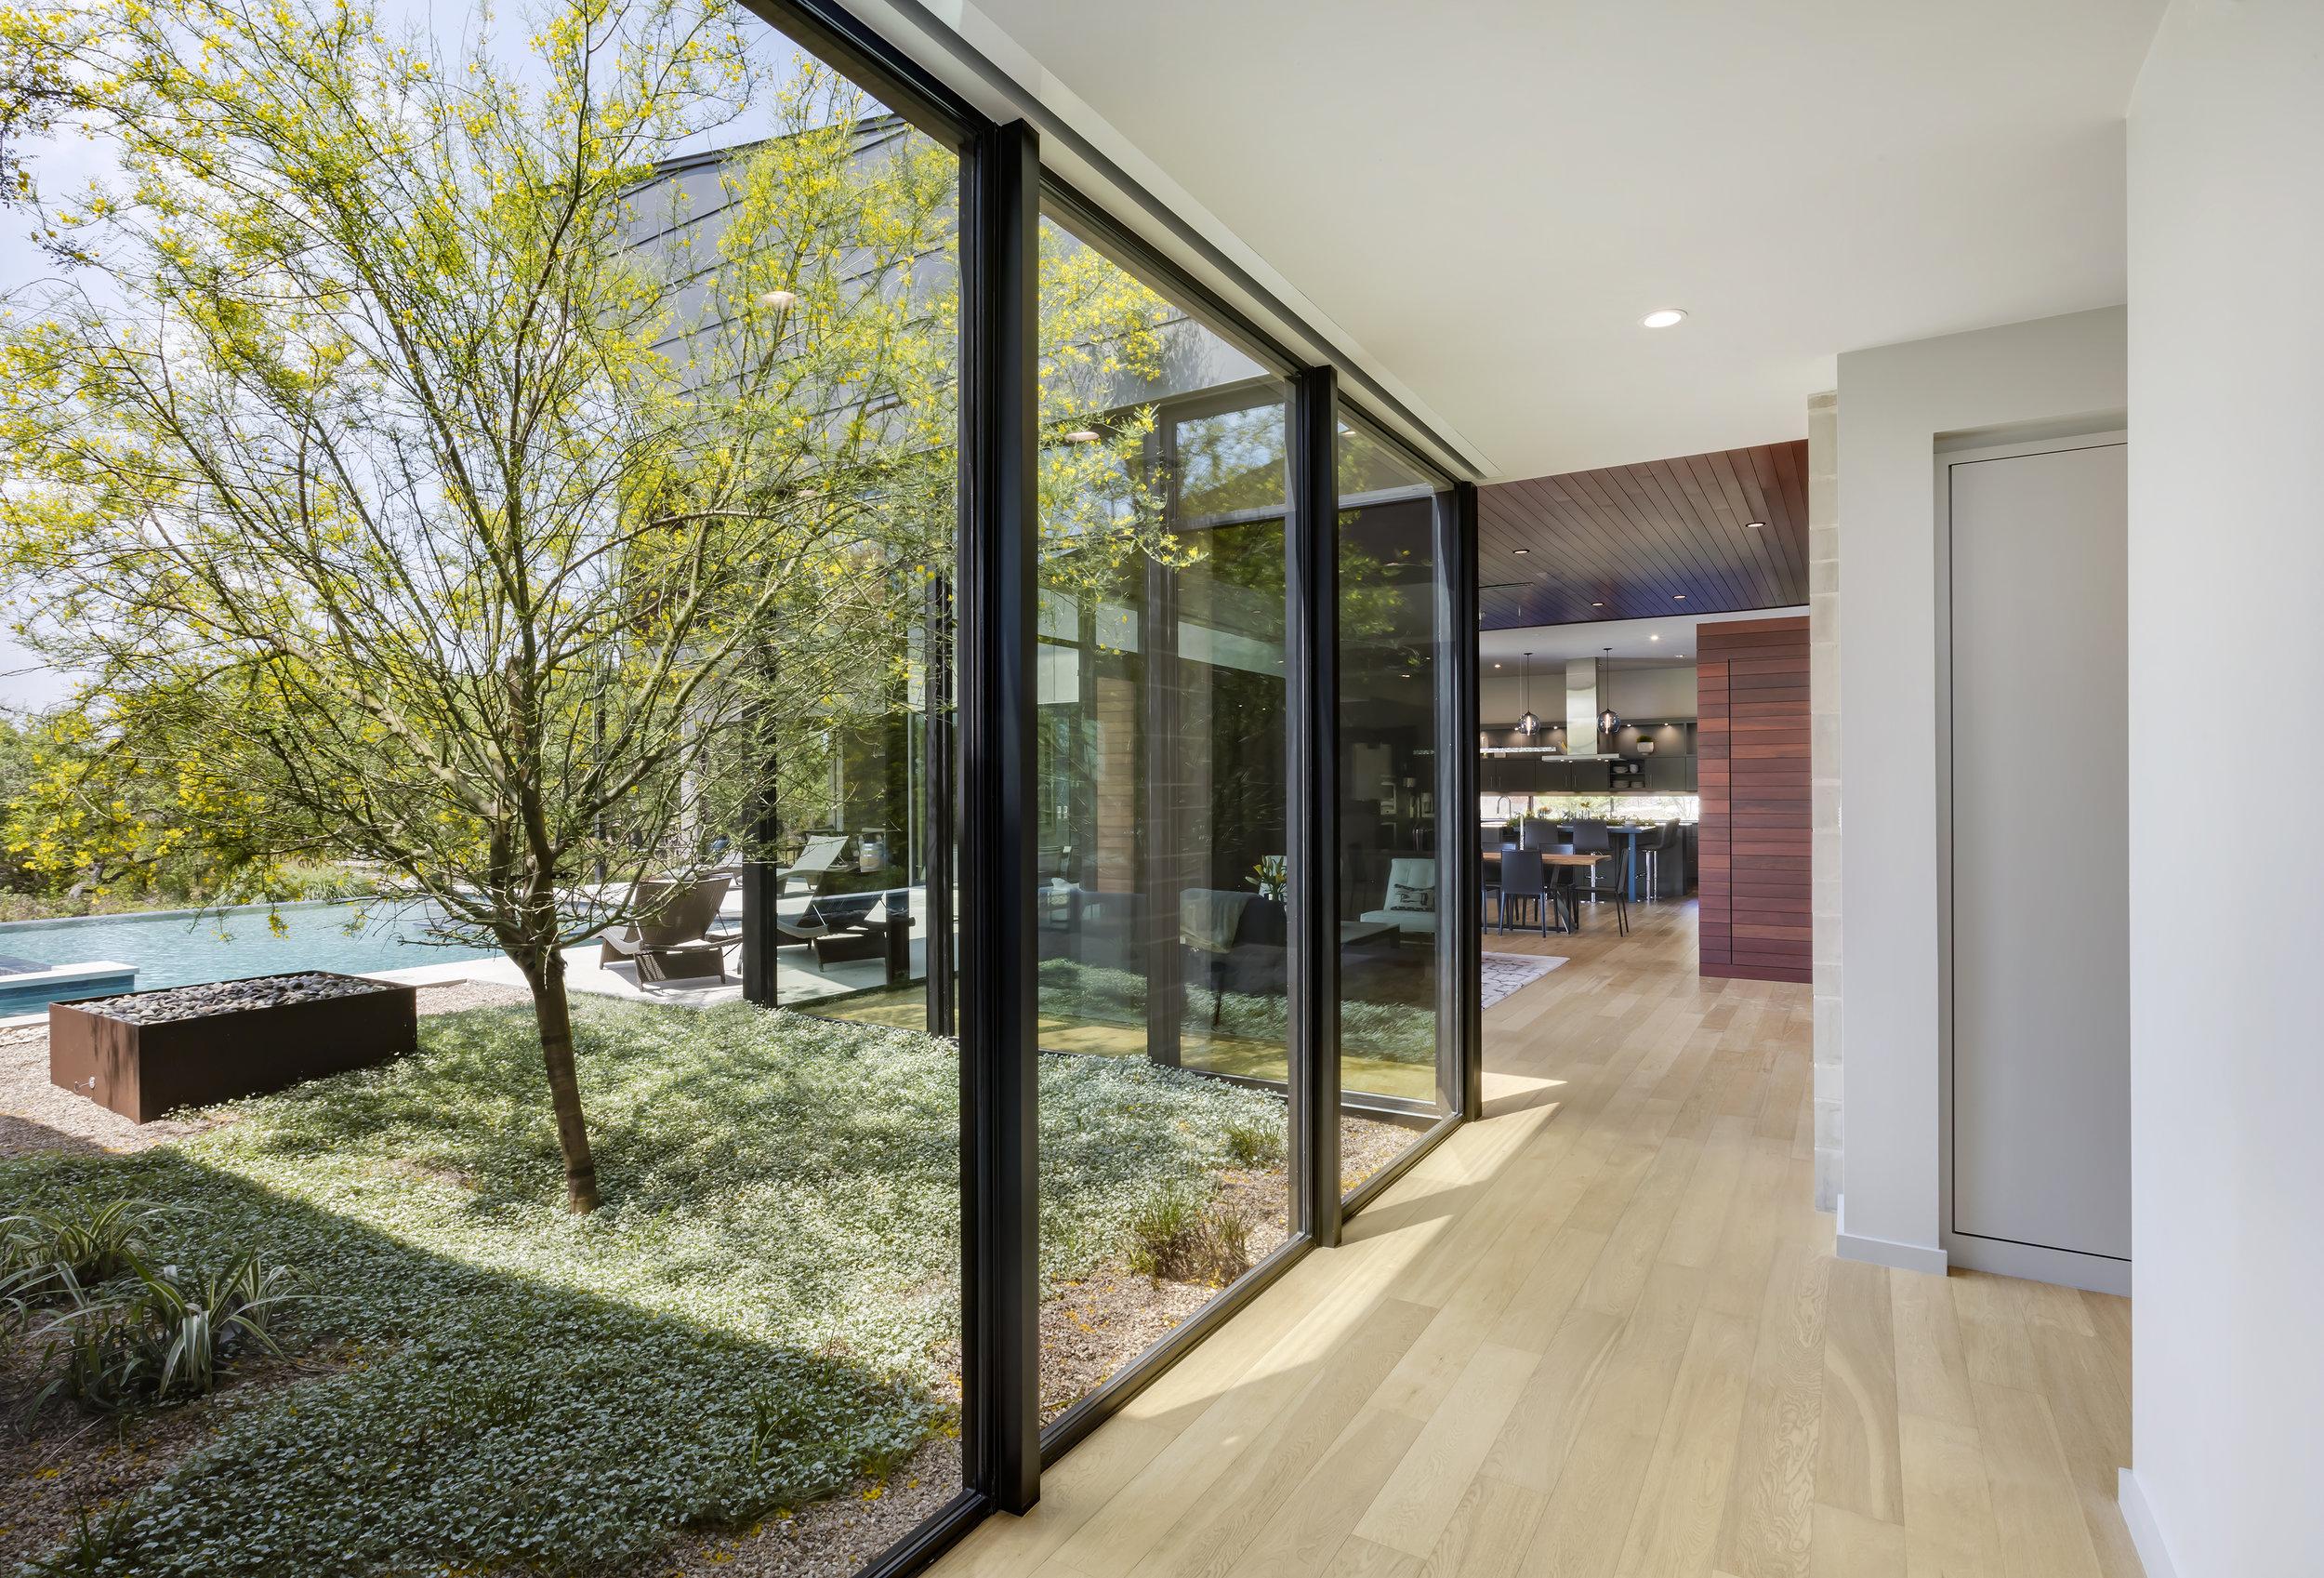 Matt Fajkus MF Architecture_Control-Shift House_Interior Photo 10 by Charles Davis Smith.jpg